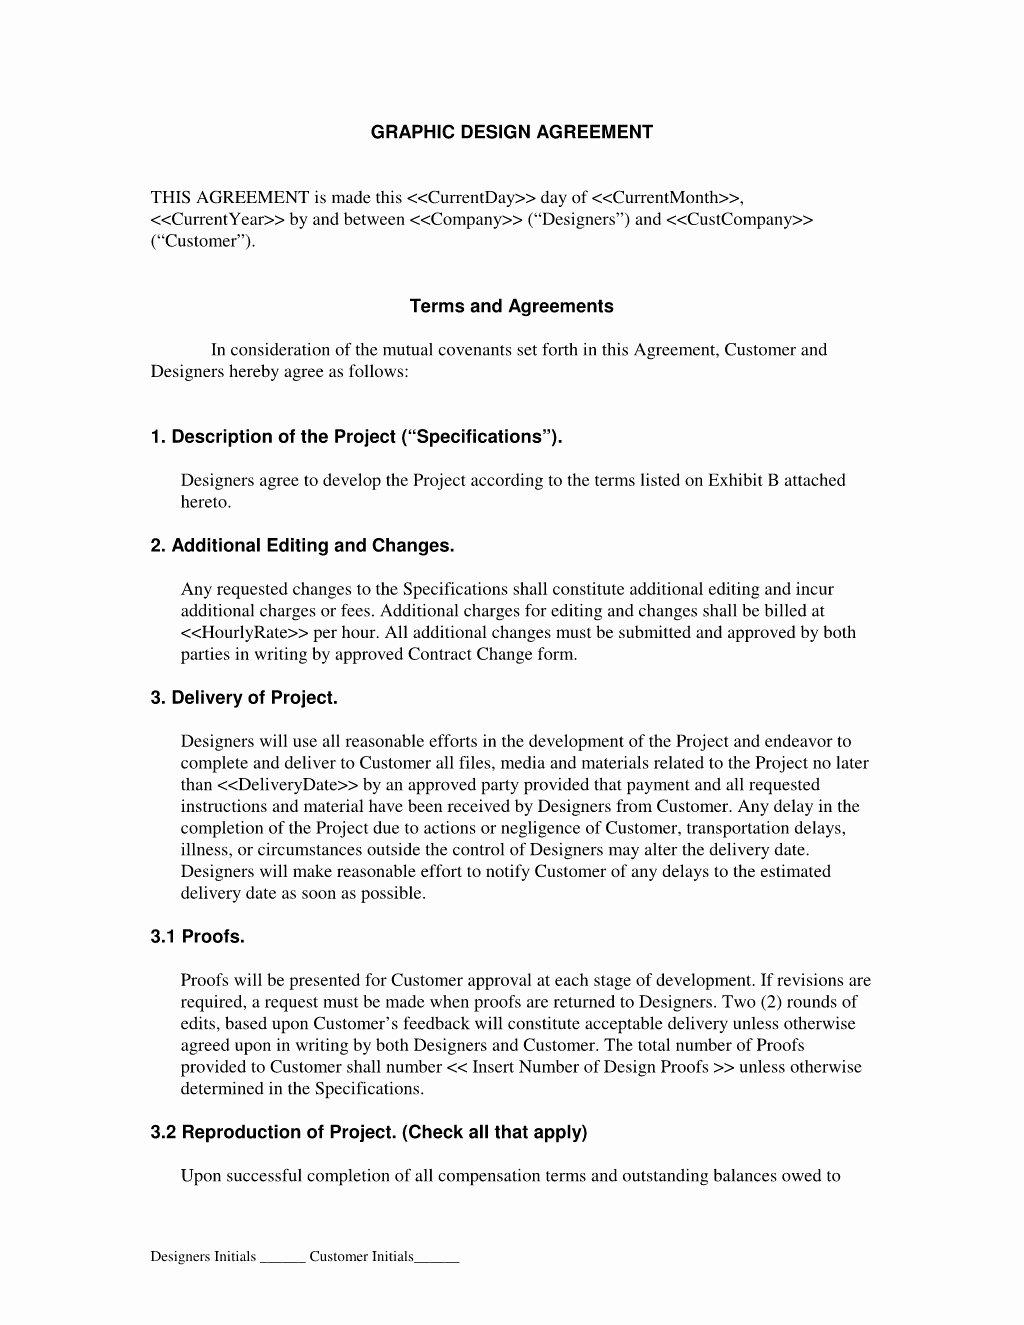 Graphic Design Contract Template Pdf Inspirational Graphic Design Contract Agreement